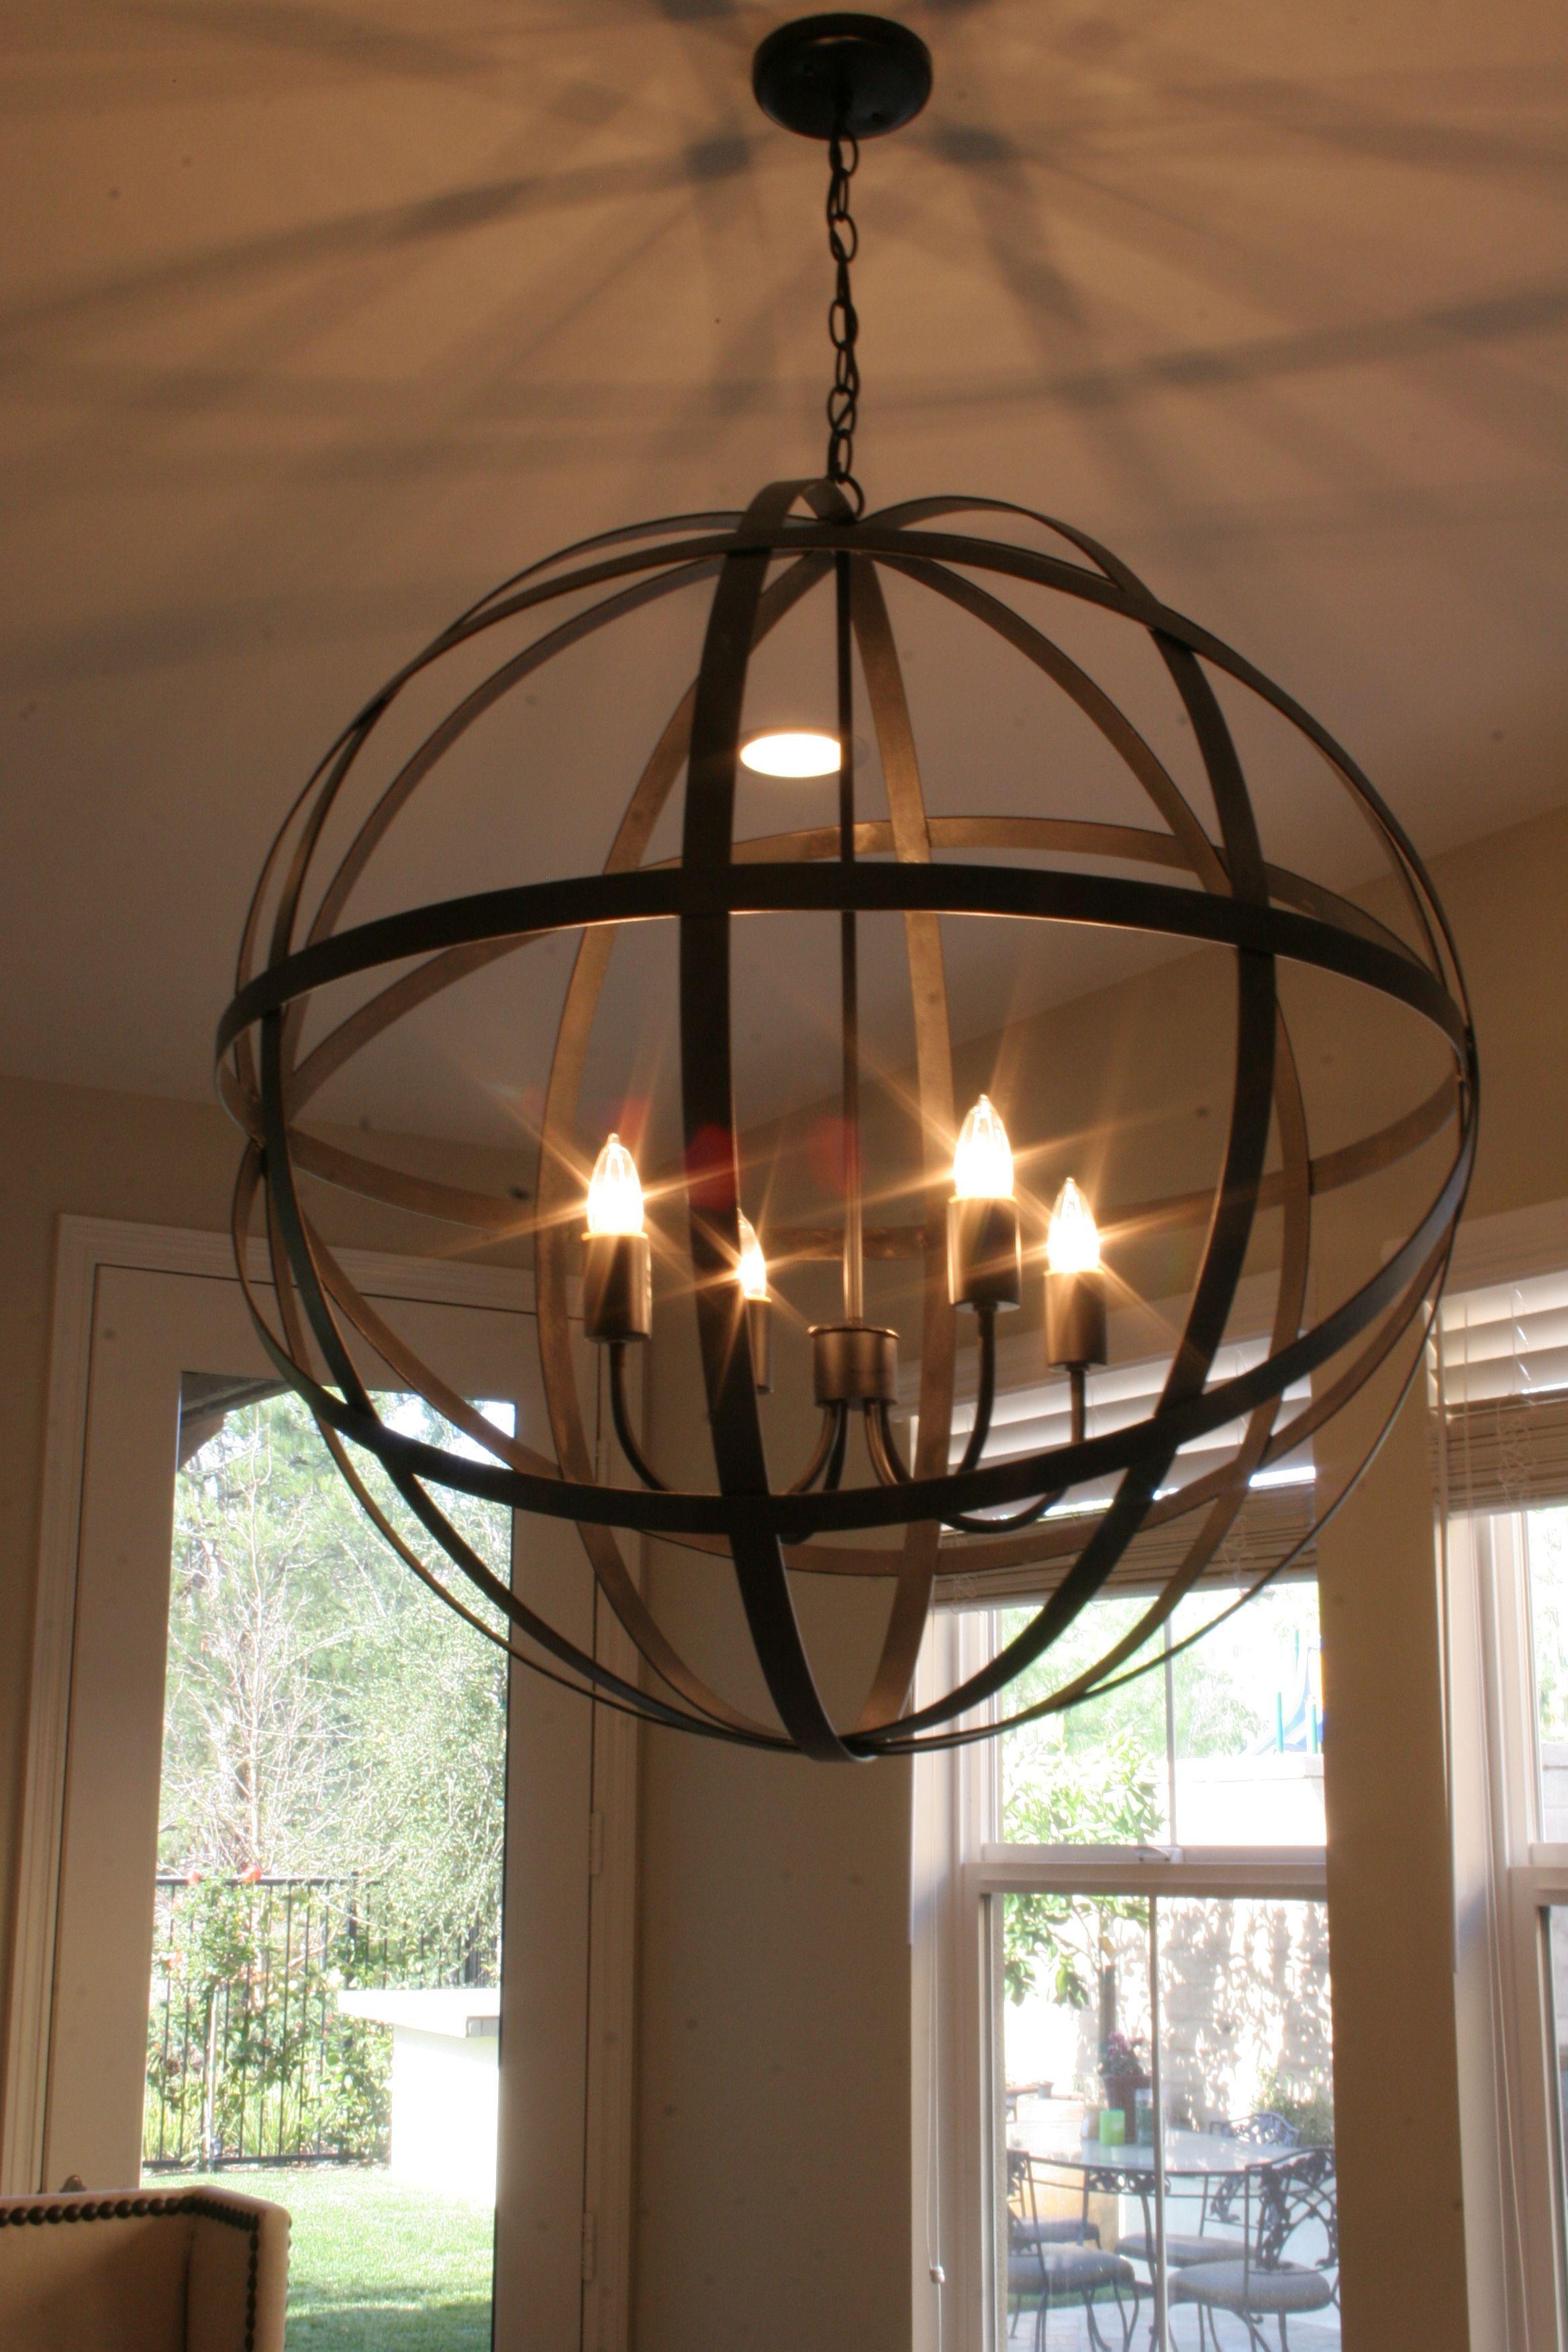 Restoration hardware chandelier get the junk store guy to make a